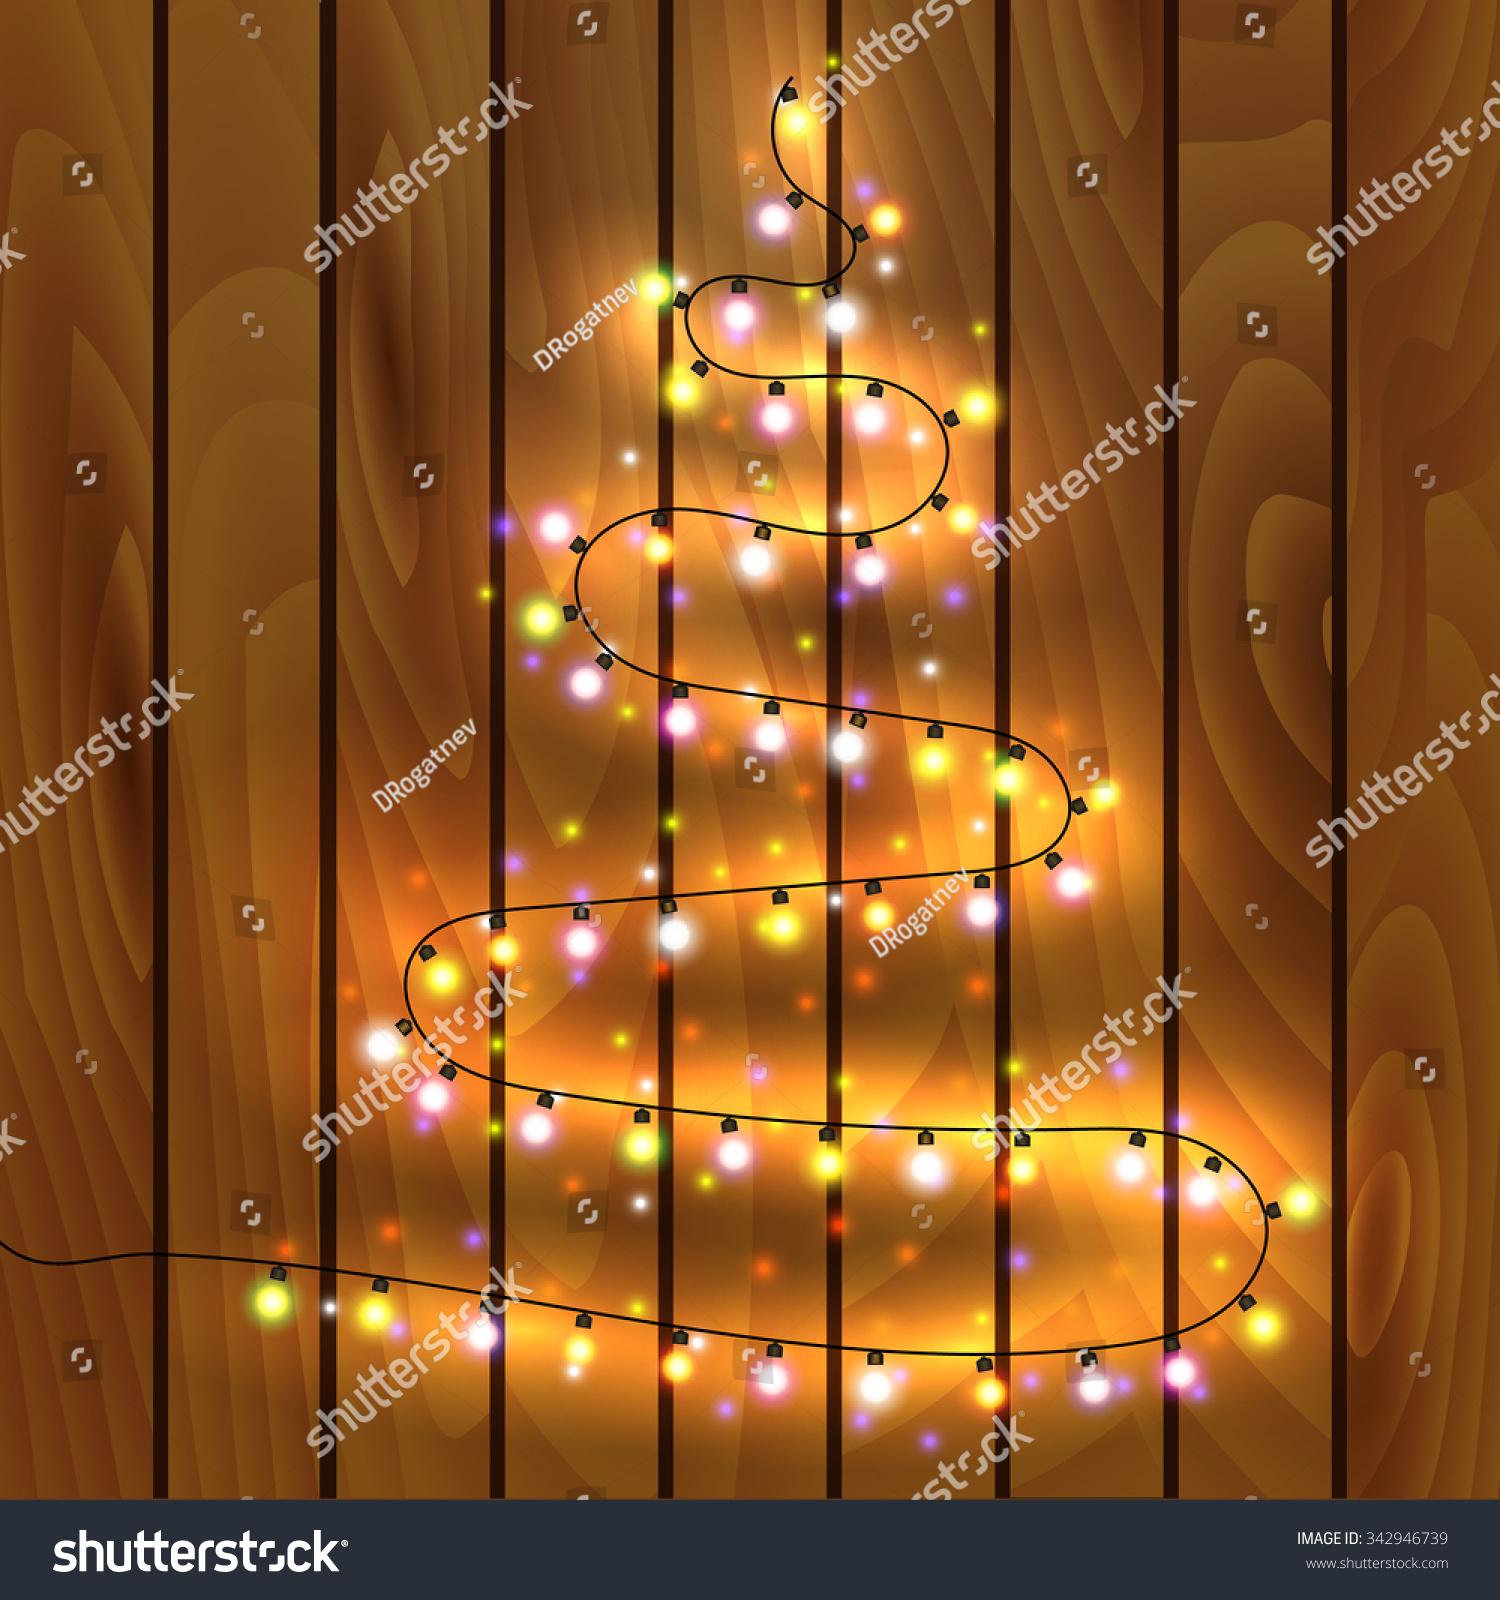 christmas tree made christmas lights vector stock vector 342946739 shutterstock. Black Bedroom Furniture Sets. Home Design Ideas